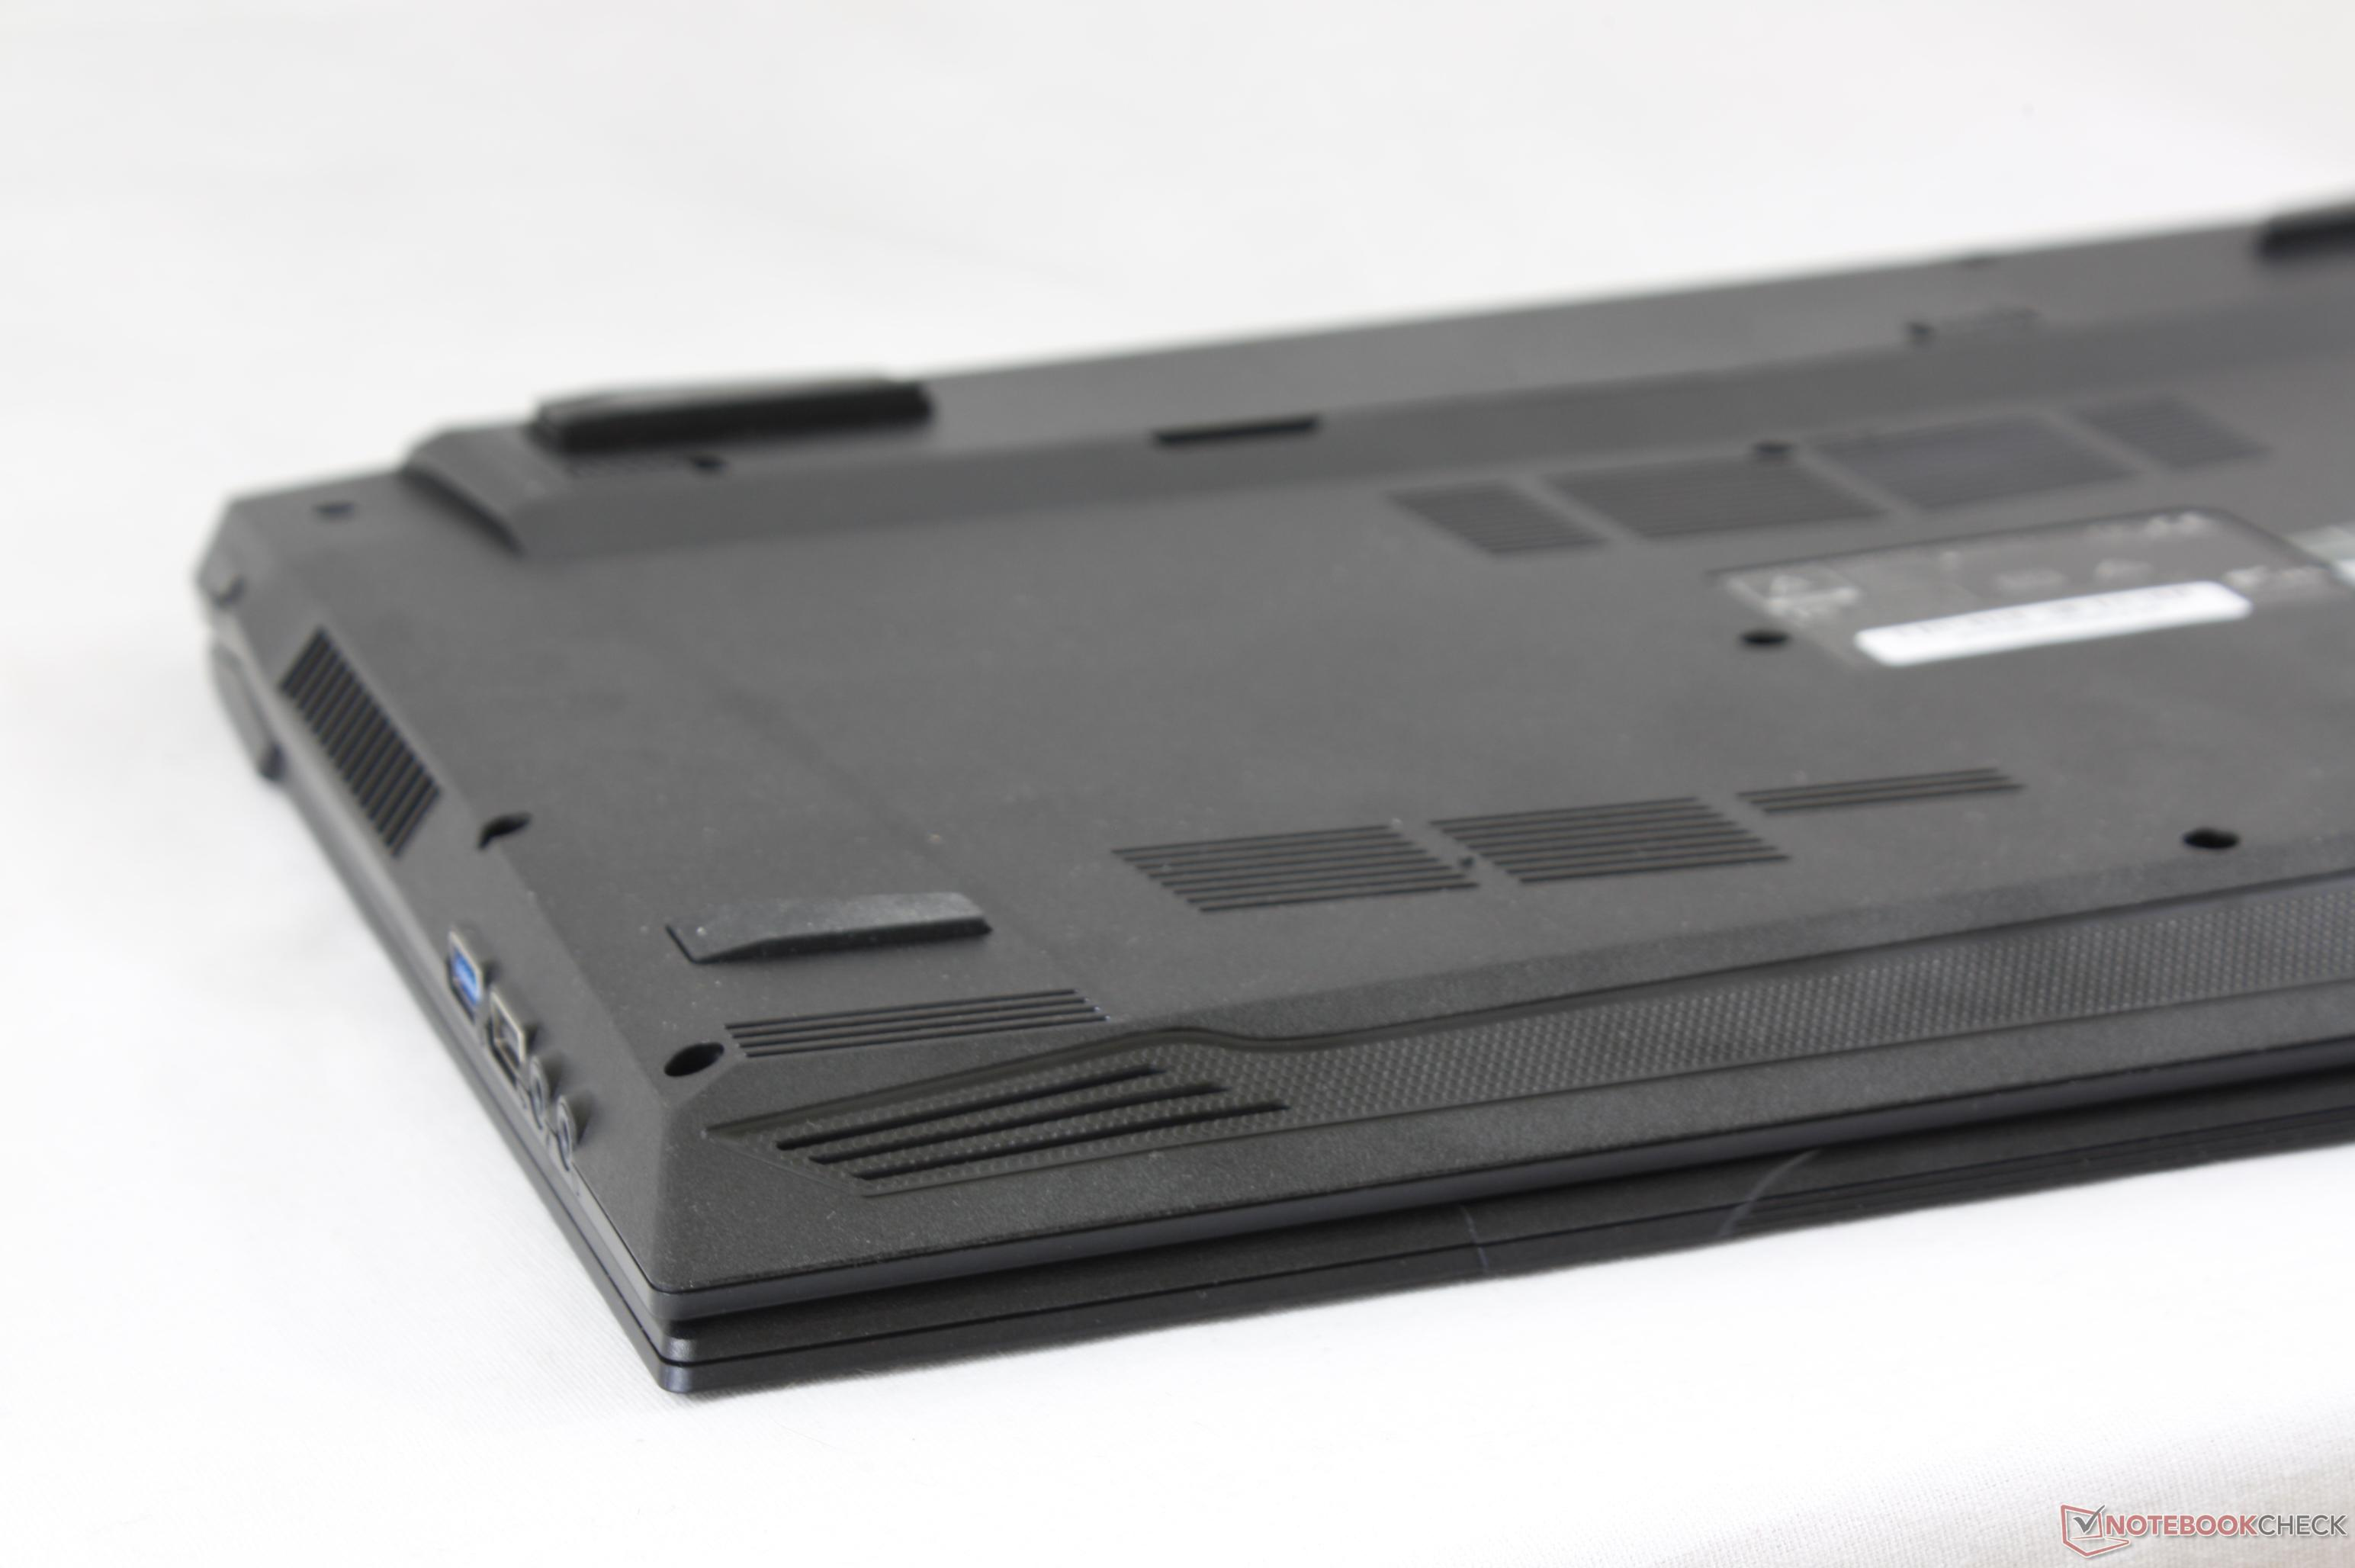 SONY VAIO VPCF13JFXB RICOH PCIE MEMORY STICK WINDOWS 7 X64 DRIVER DOWNLOAD